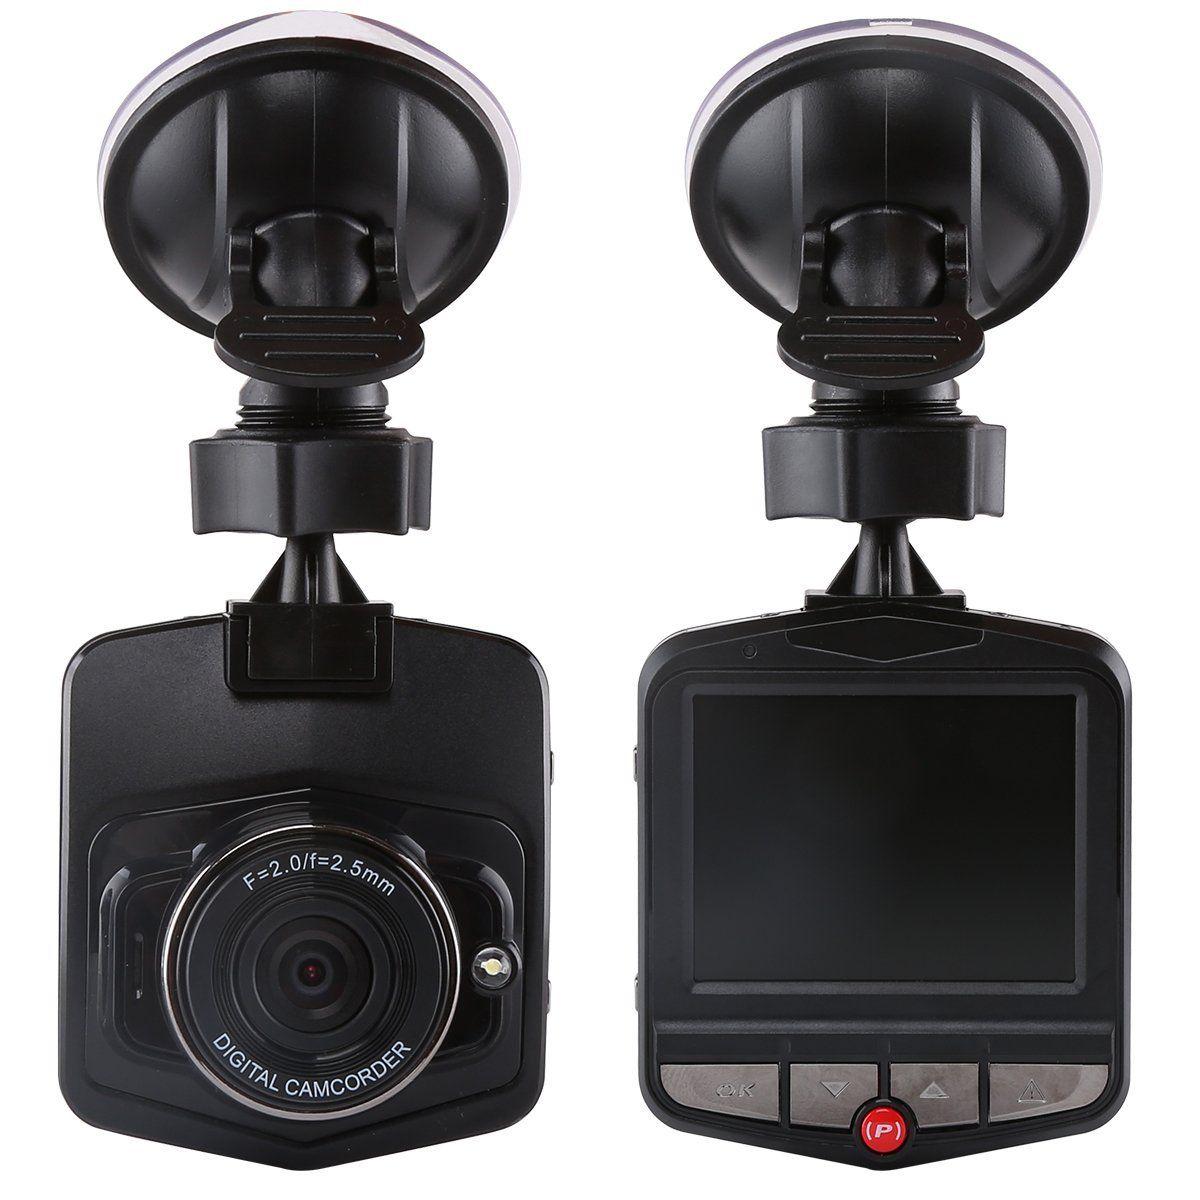 2.4 Inch Novatek Dashcam Car DVR PZ911 IR lights Support WDR G-Sensor Parking Monitoring Detection One Key Lock Cycle Recording